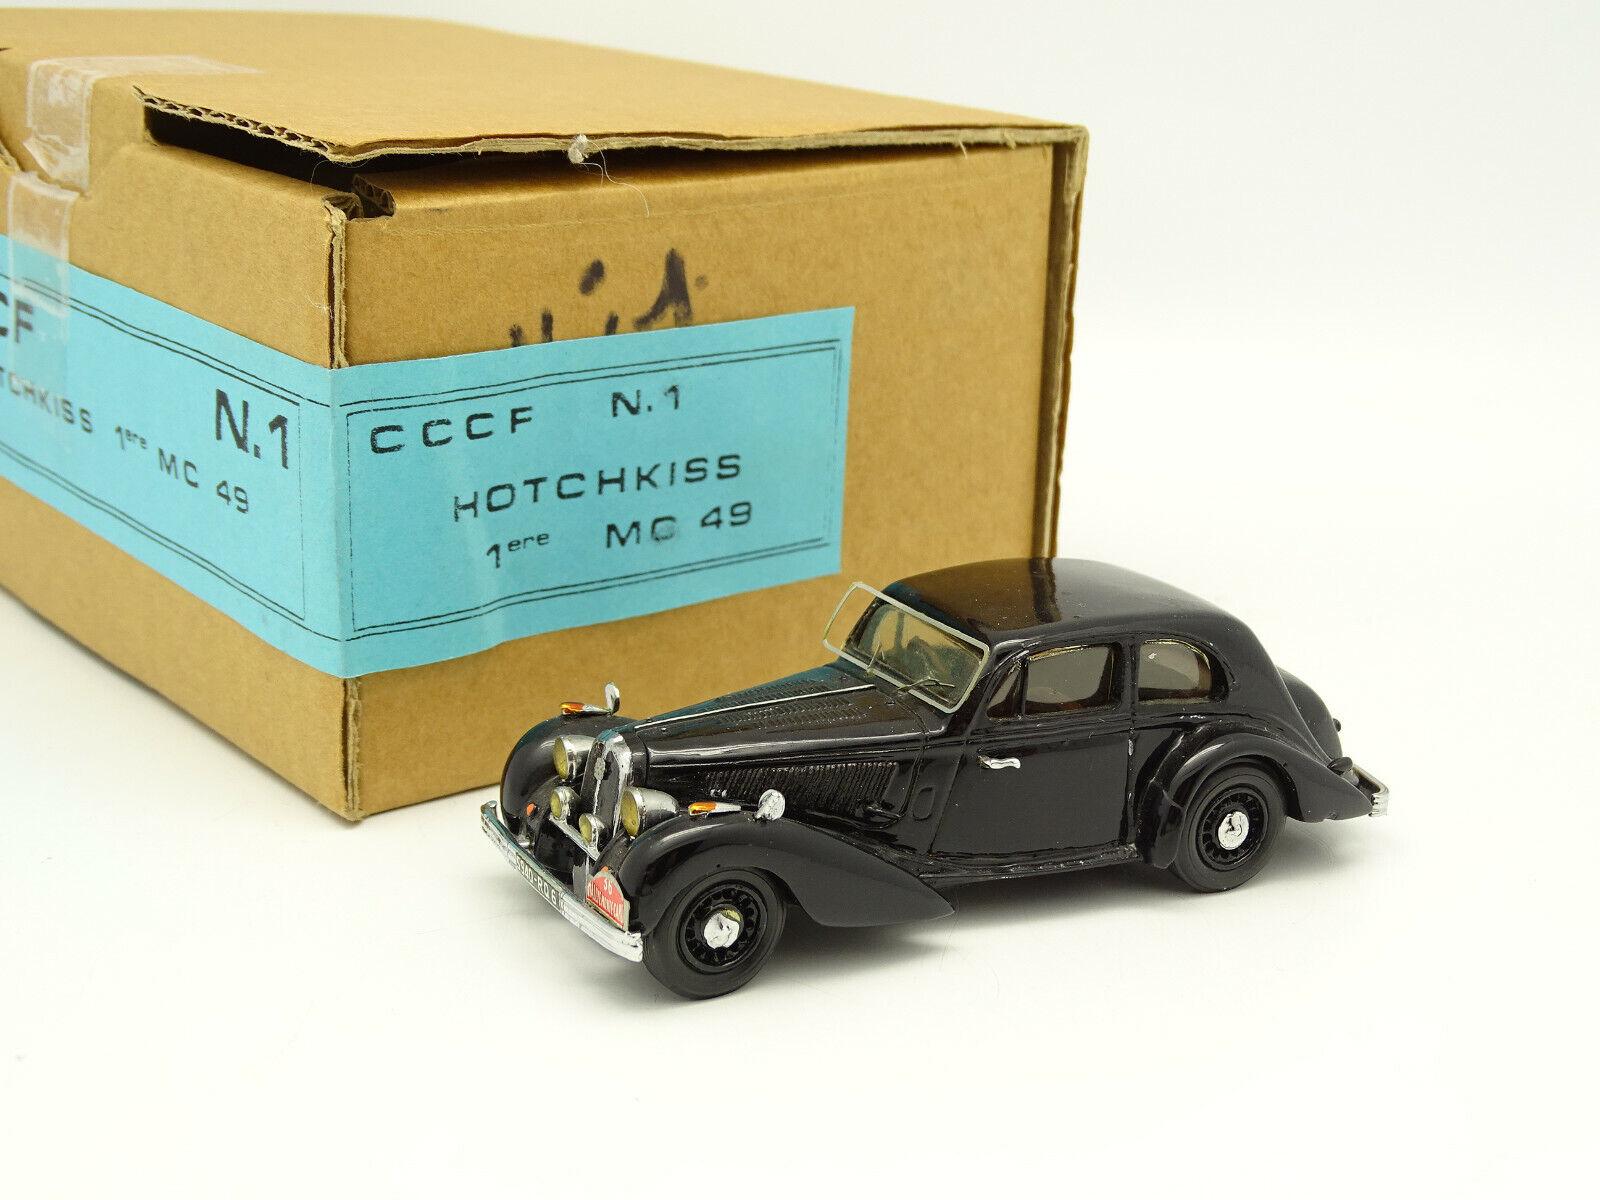 CCCF Résine 1 43 - Hotchkiss 686 Winner Rallye Monte Carlo 1949